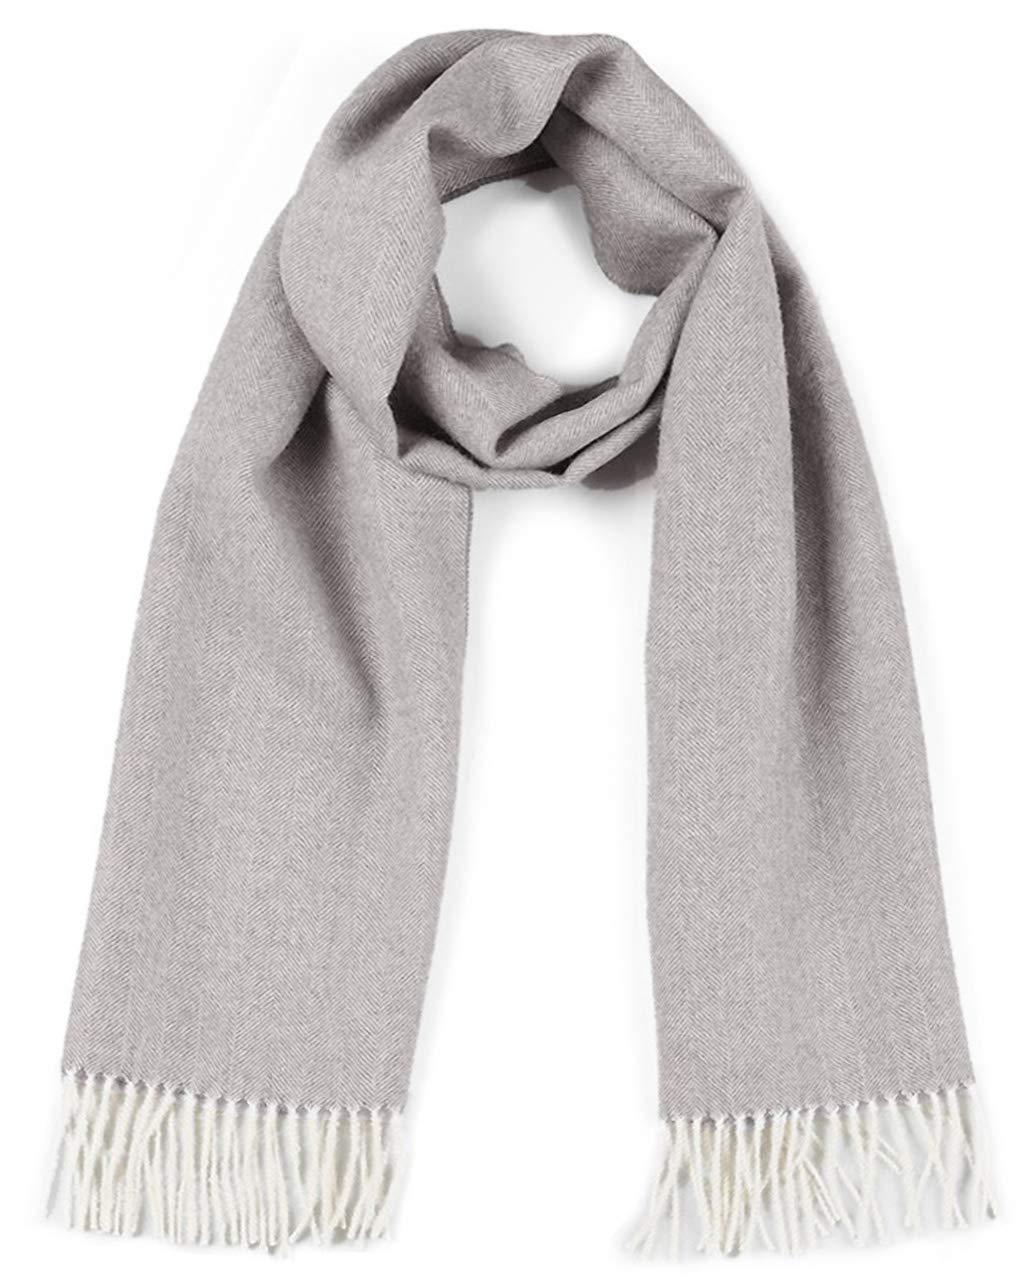 Herringbone Alpaca Scarf - 100% Baby Alpaca (Dove Gray Herringbone) by Incredible Natural Creations from Alpaca - INCA Brands (Image #1)